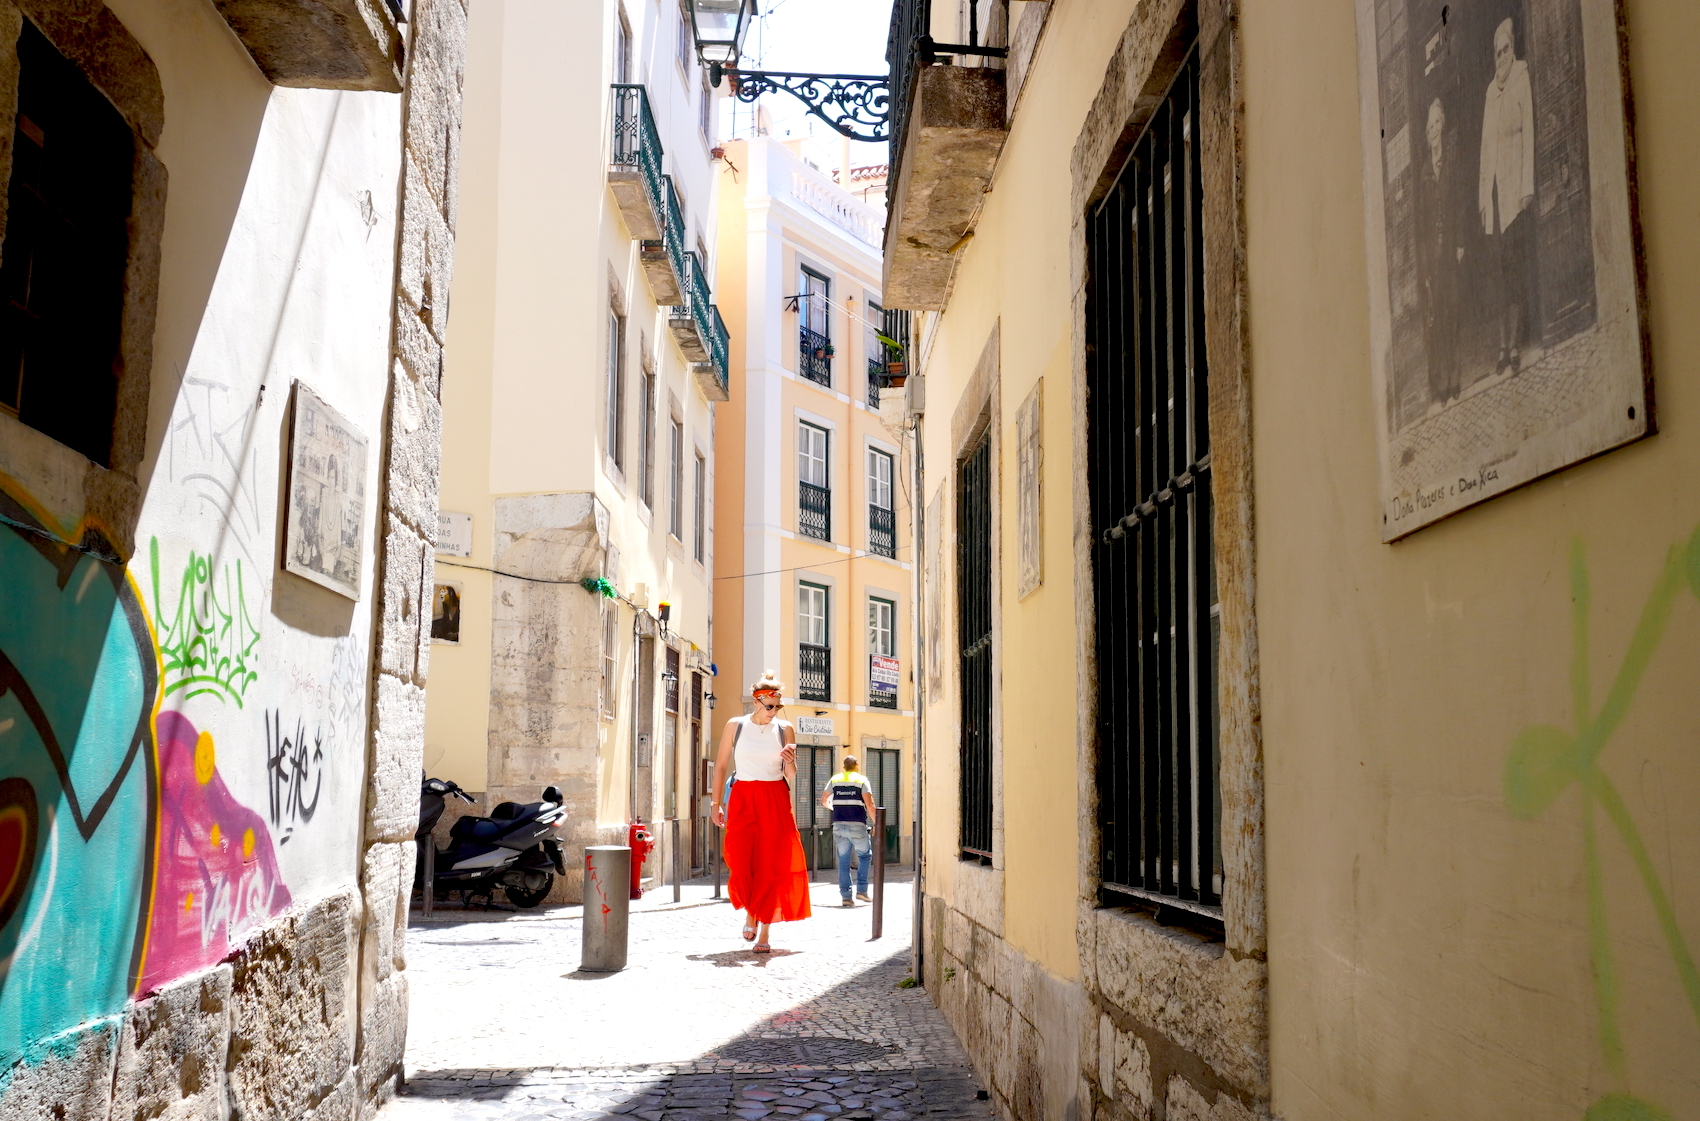 Streets in Lisbon